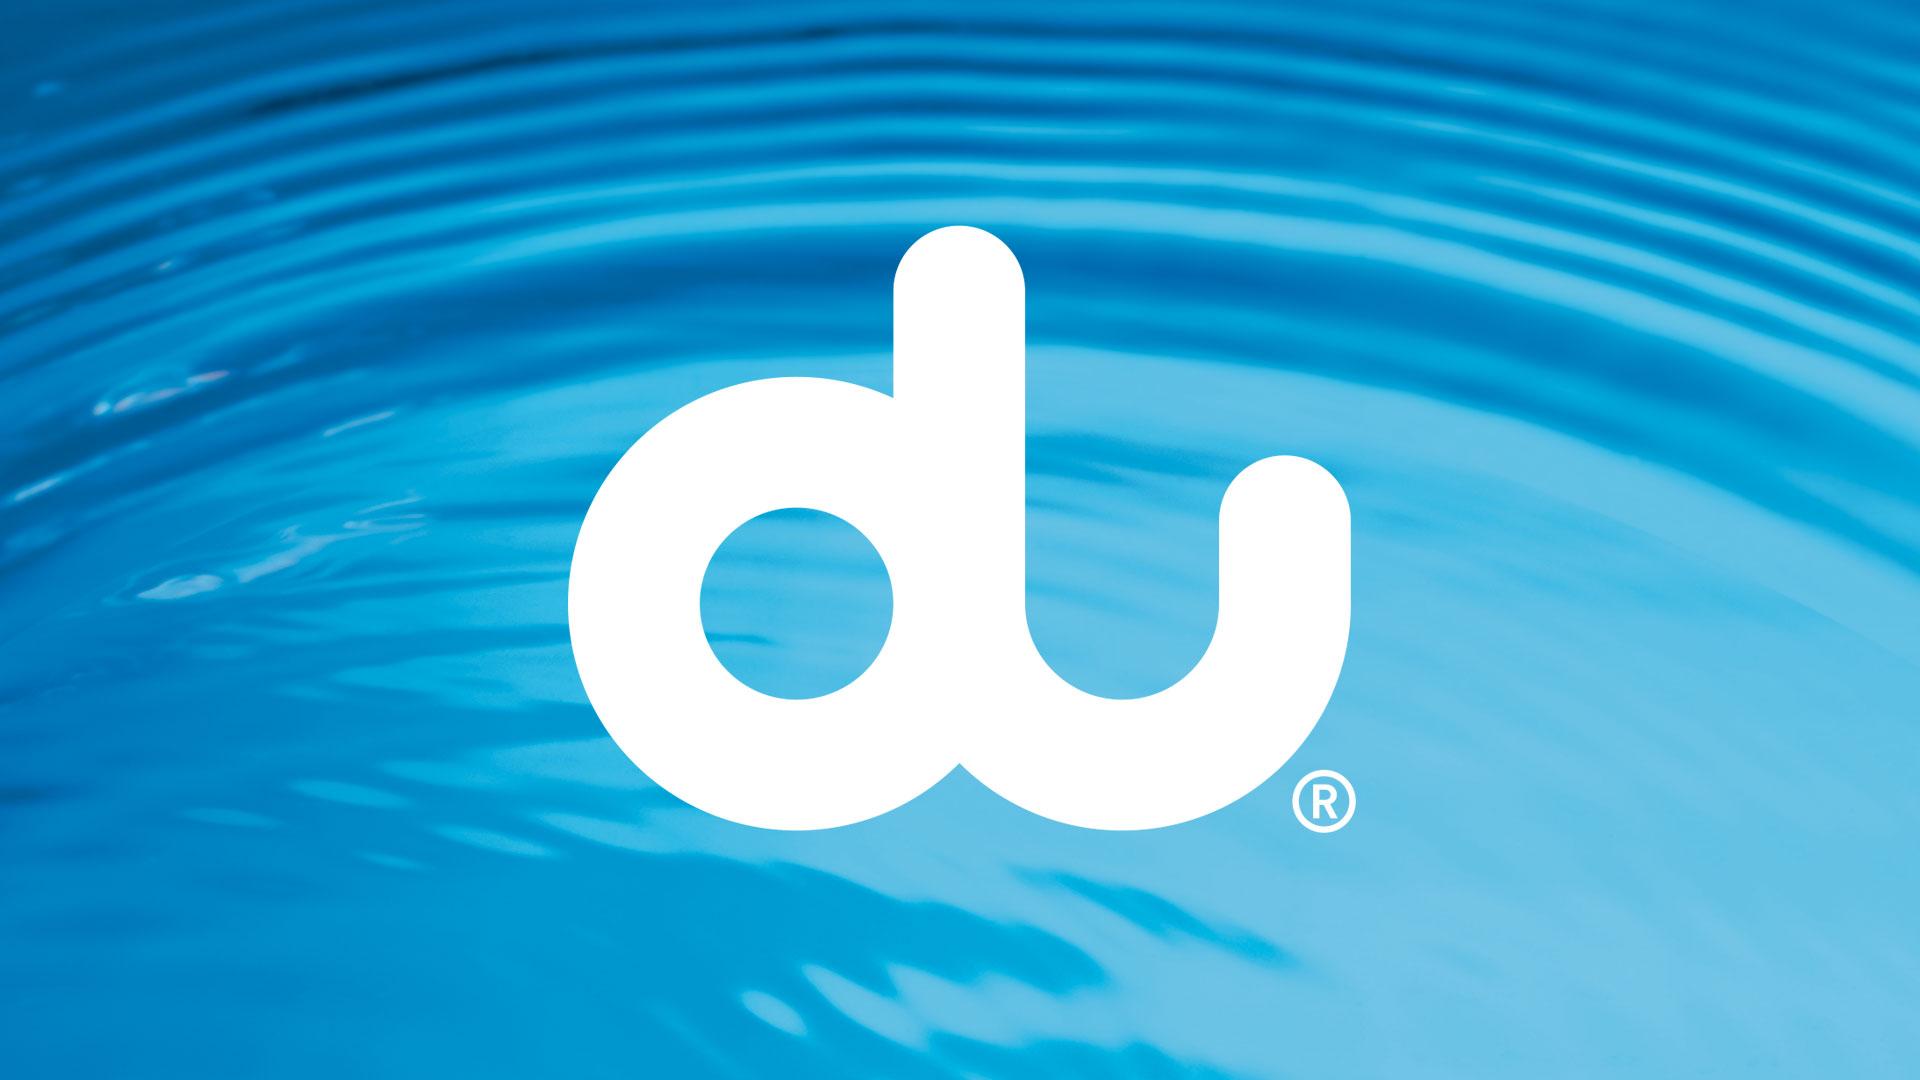 DU: an award-winning and vibrant 4G LTE network